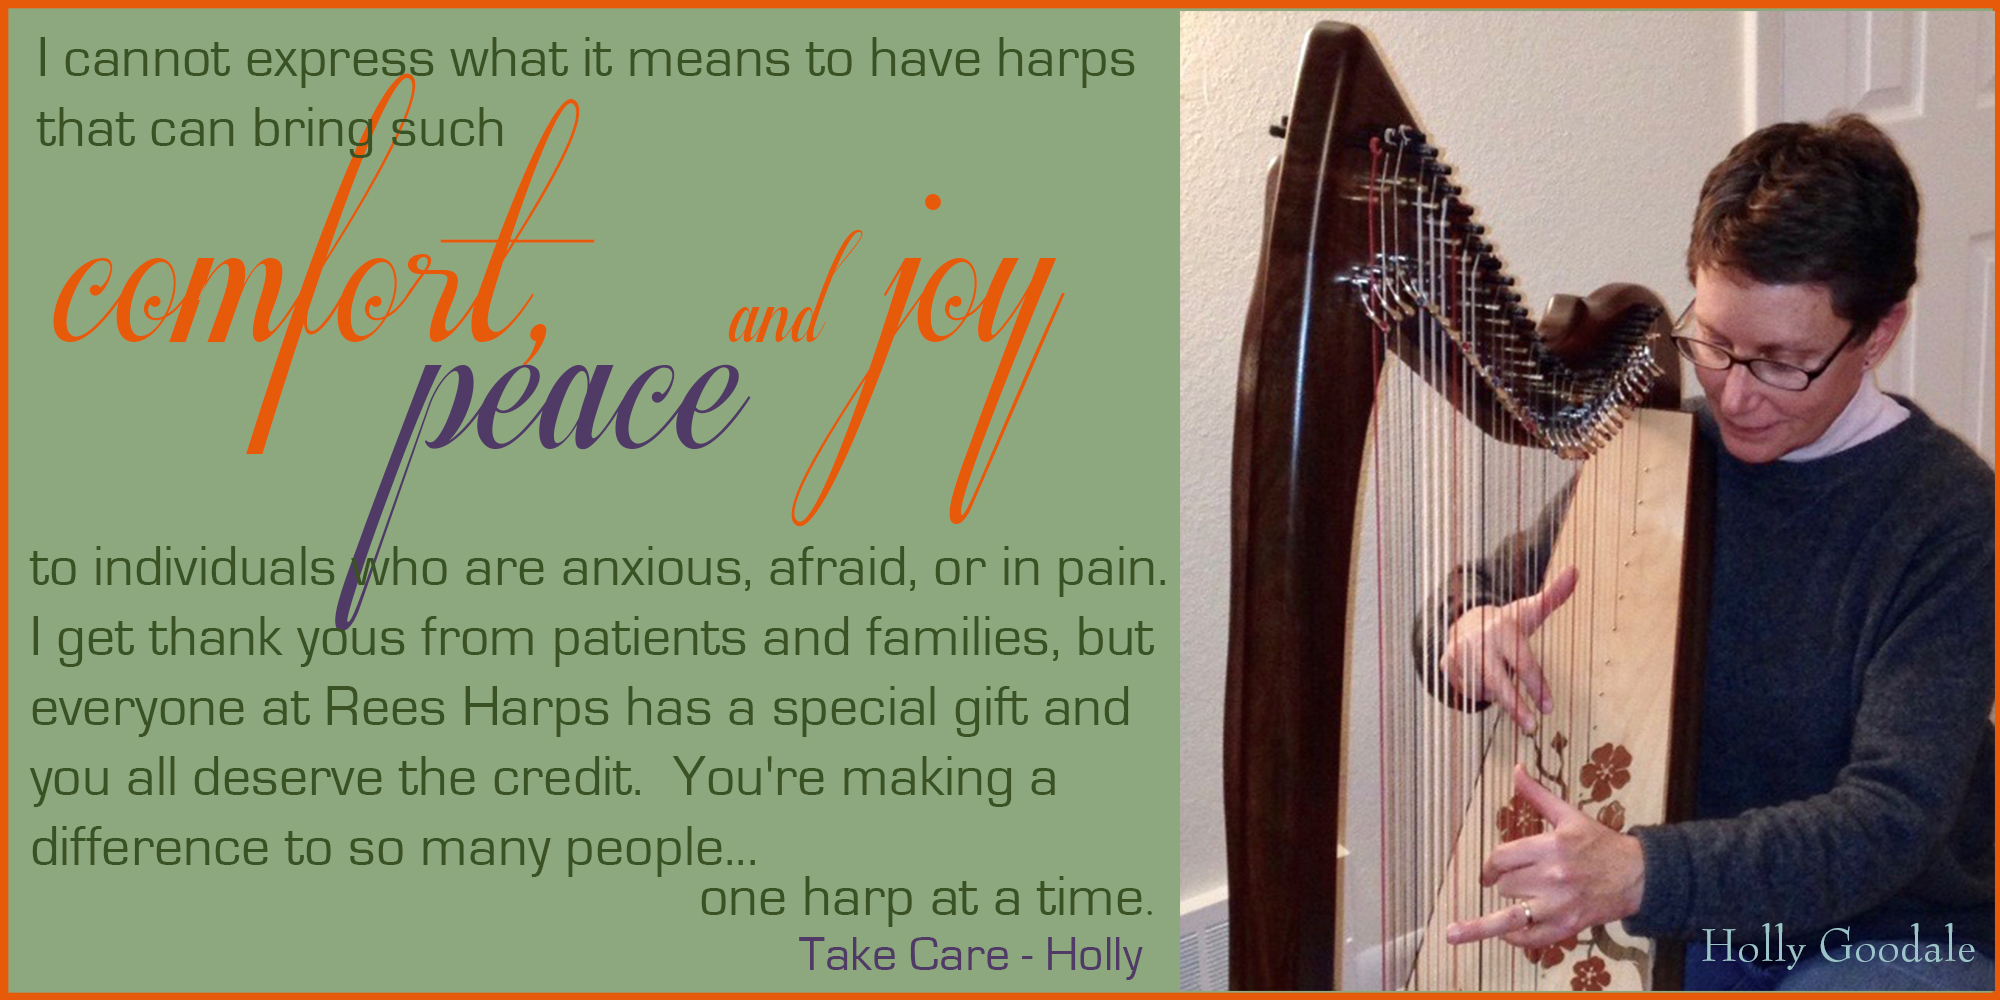 Mariposa Harp and Holly Goodale